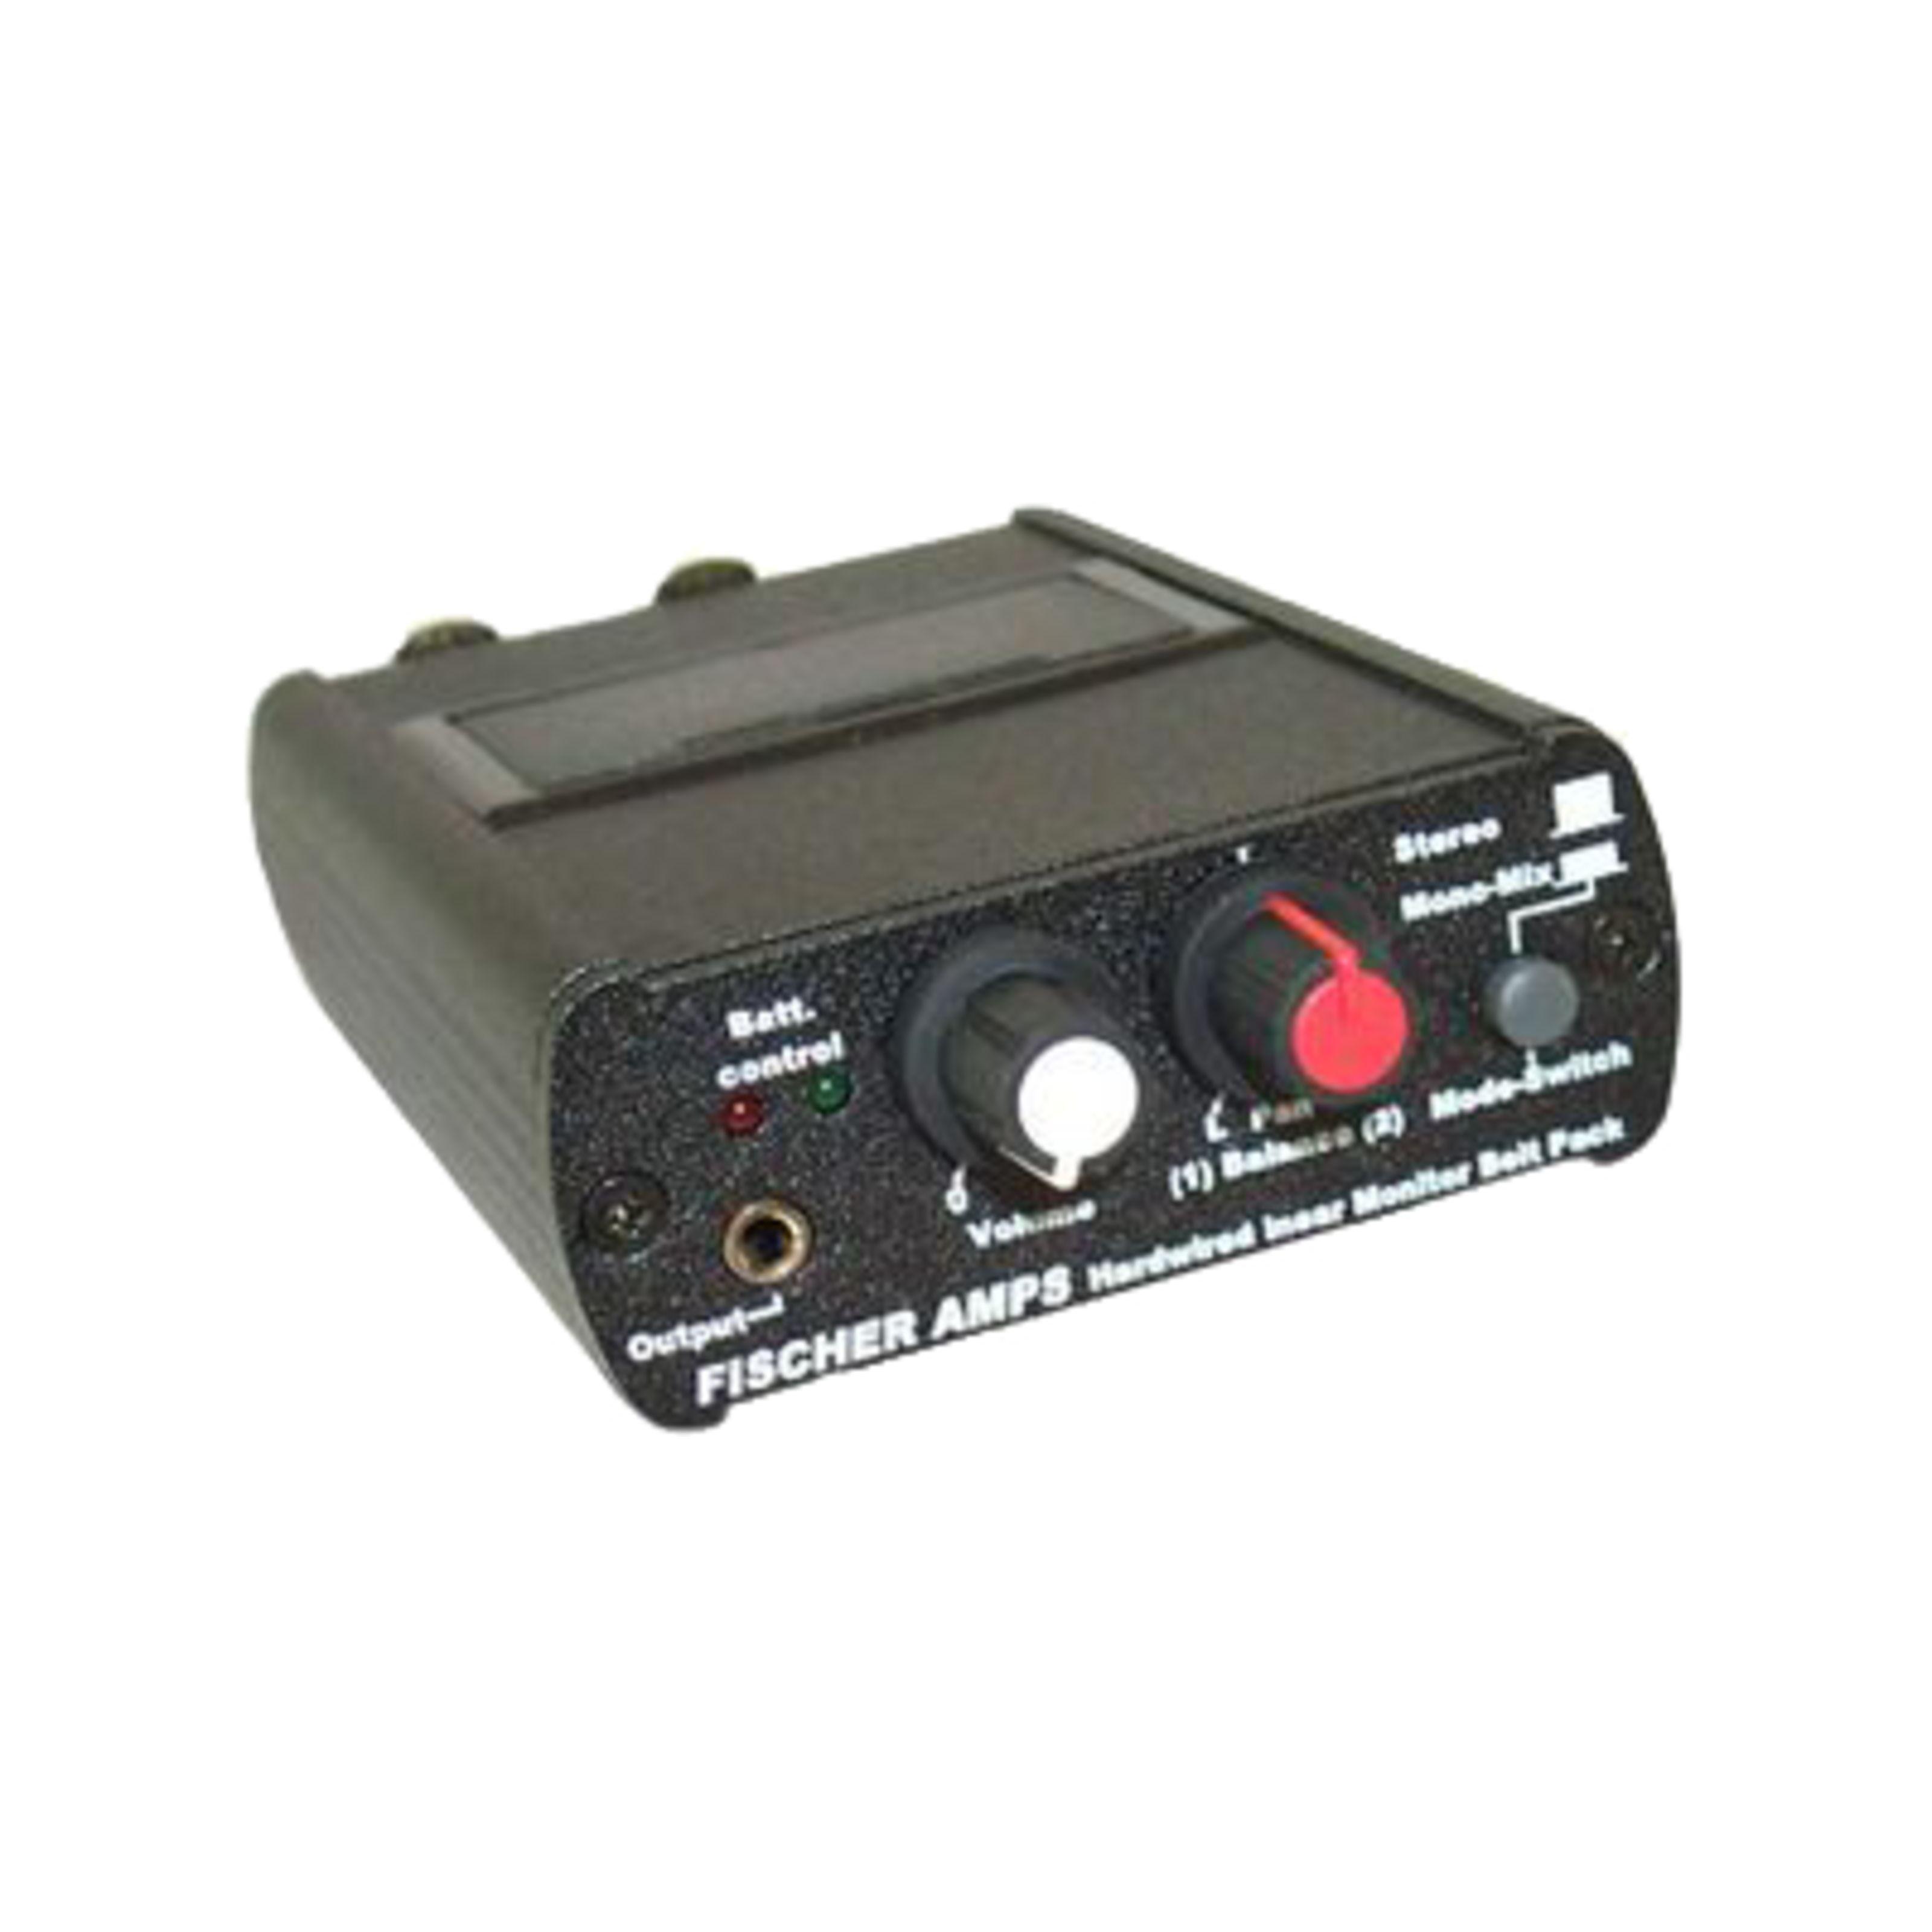 Fischer Amps - In-Ear Monitor Beltpack 2x XLR-Eingänge 001100